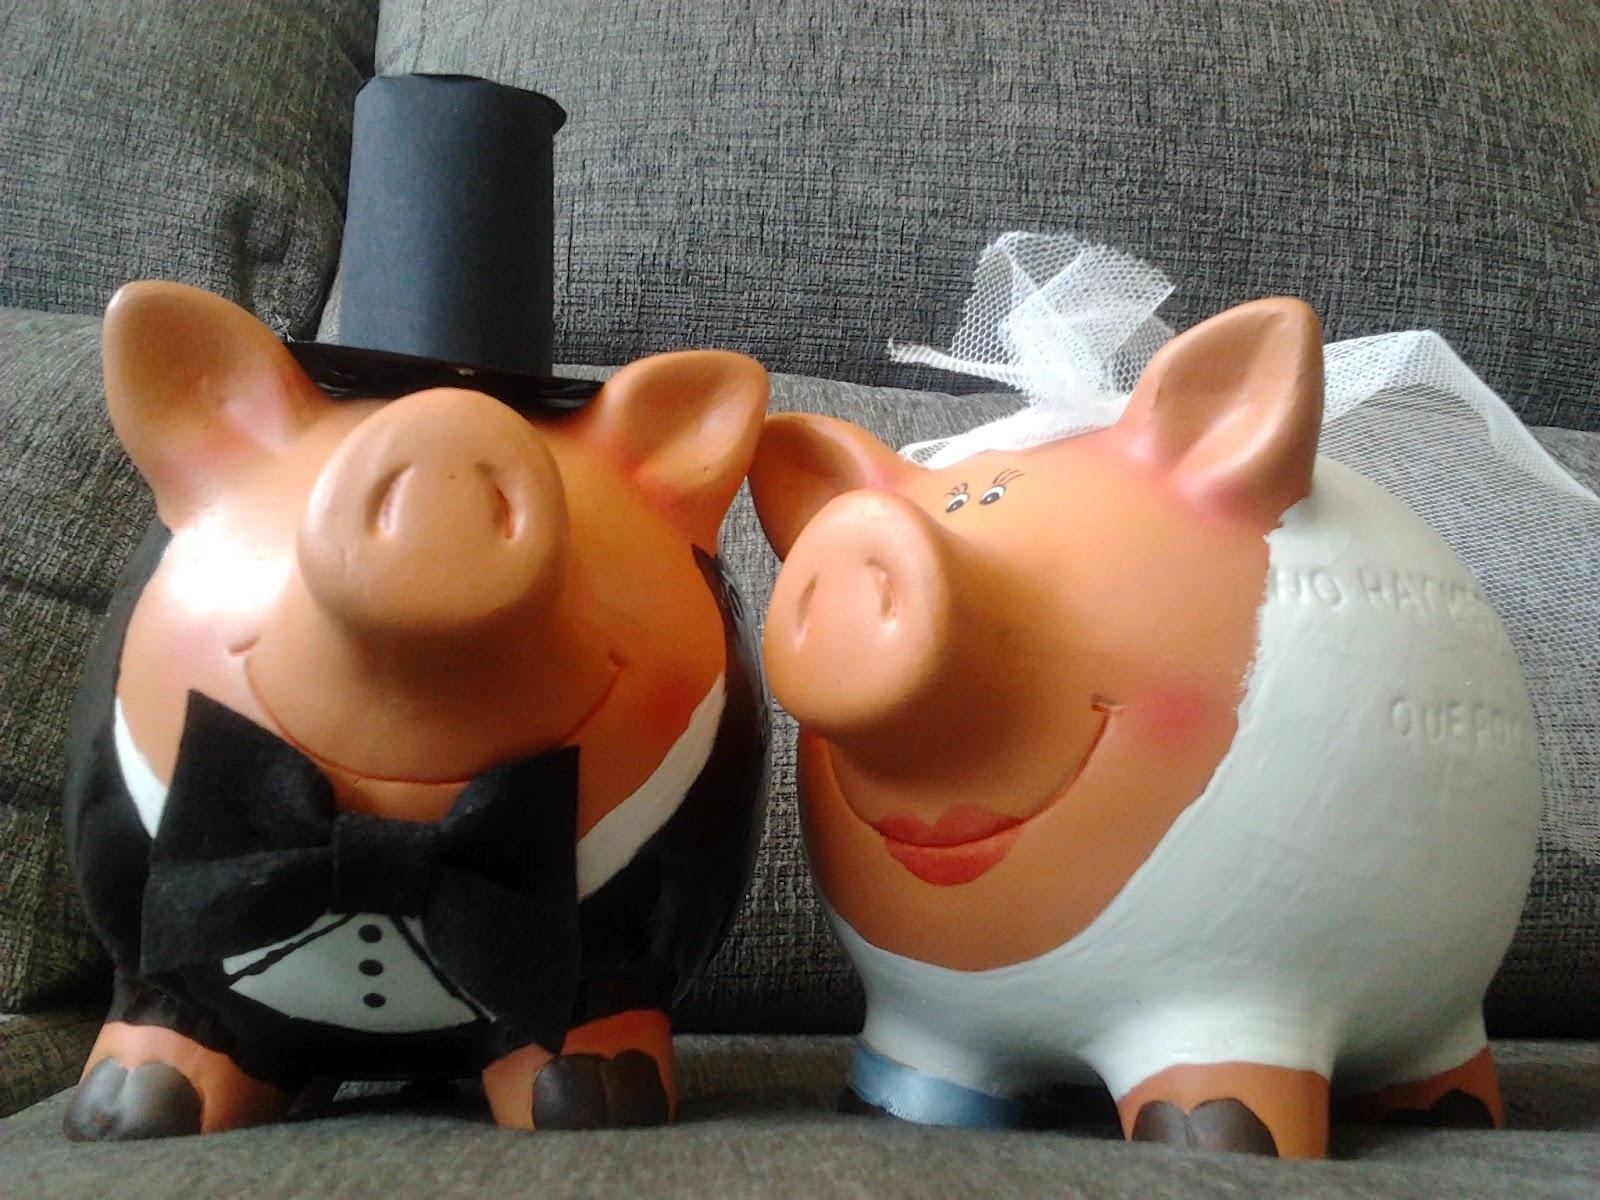 boda, novios, amigos, detalles, regalos, proximos novios, futuros novios, celebracion, cereminoa, tazas, wonderfull, lego, chapas, cupcakes, marionetas, original, creativos, sorpresa